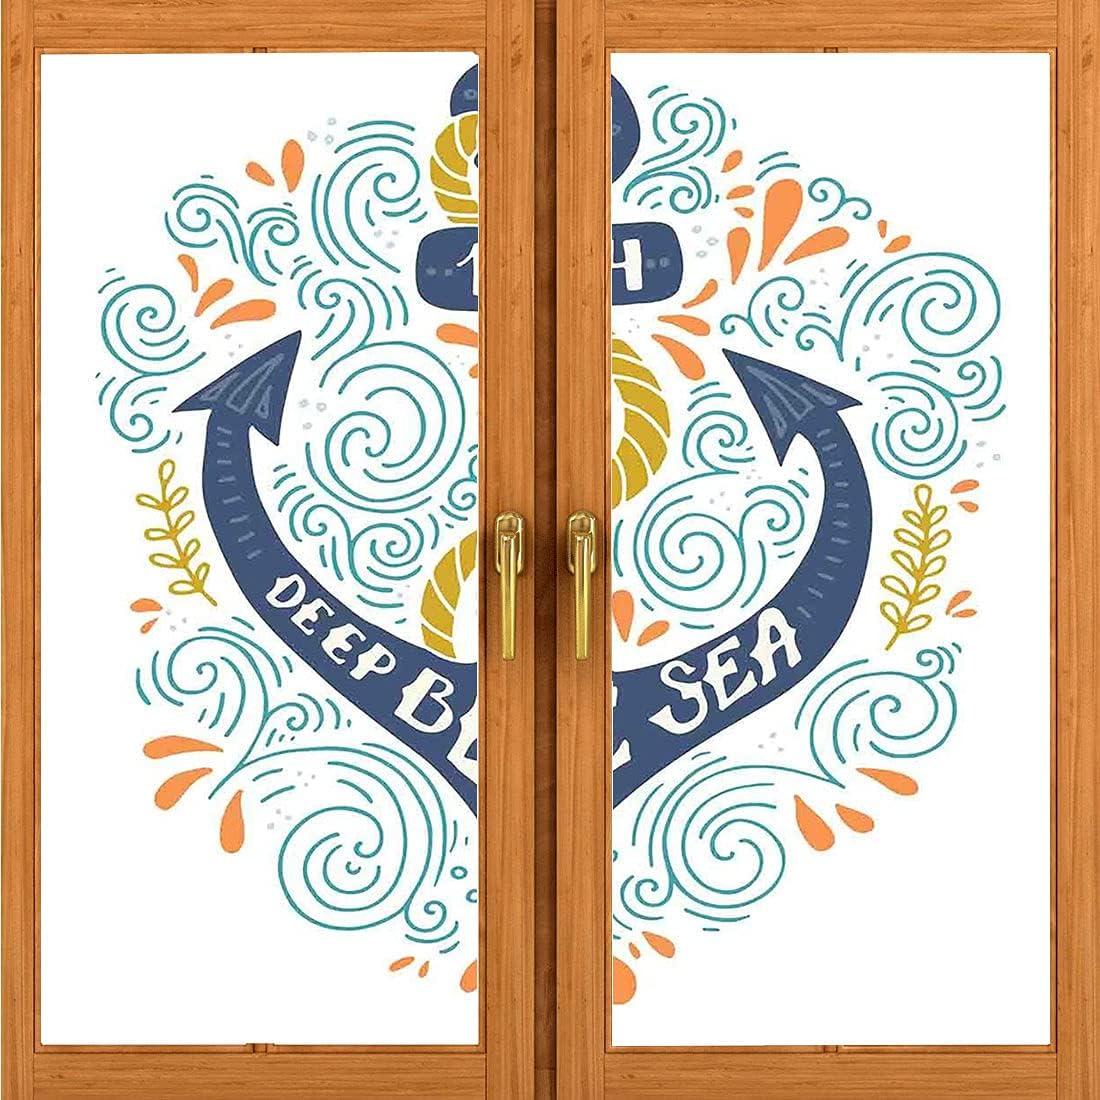 Decorative Static Glass Film, Nautical Decor,Colorful Anchor Letterers Deep Blue Sea Marine Design Sea Ship Nautical Decorative, Removable Door Wall Mural Door Stickers L17.7 x H78.7